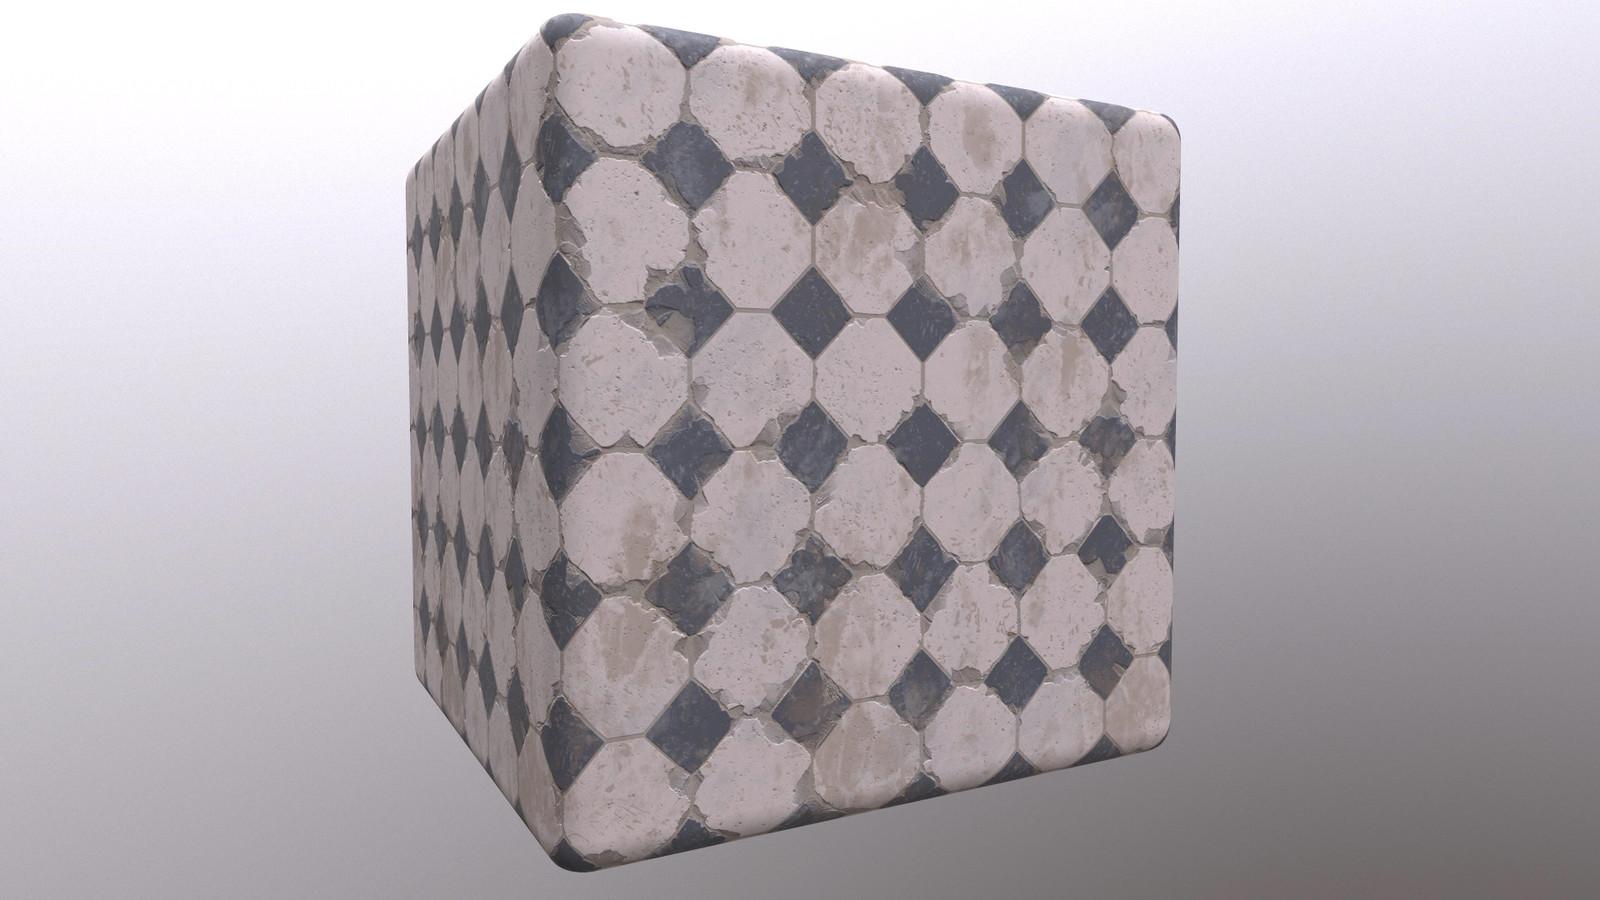 Substance Tile Study